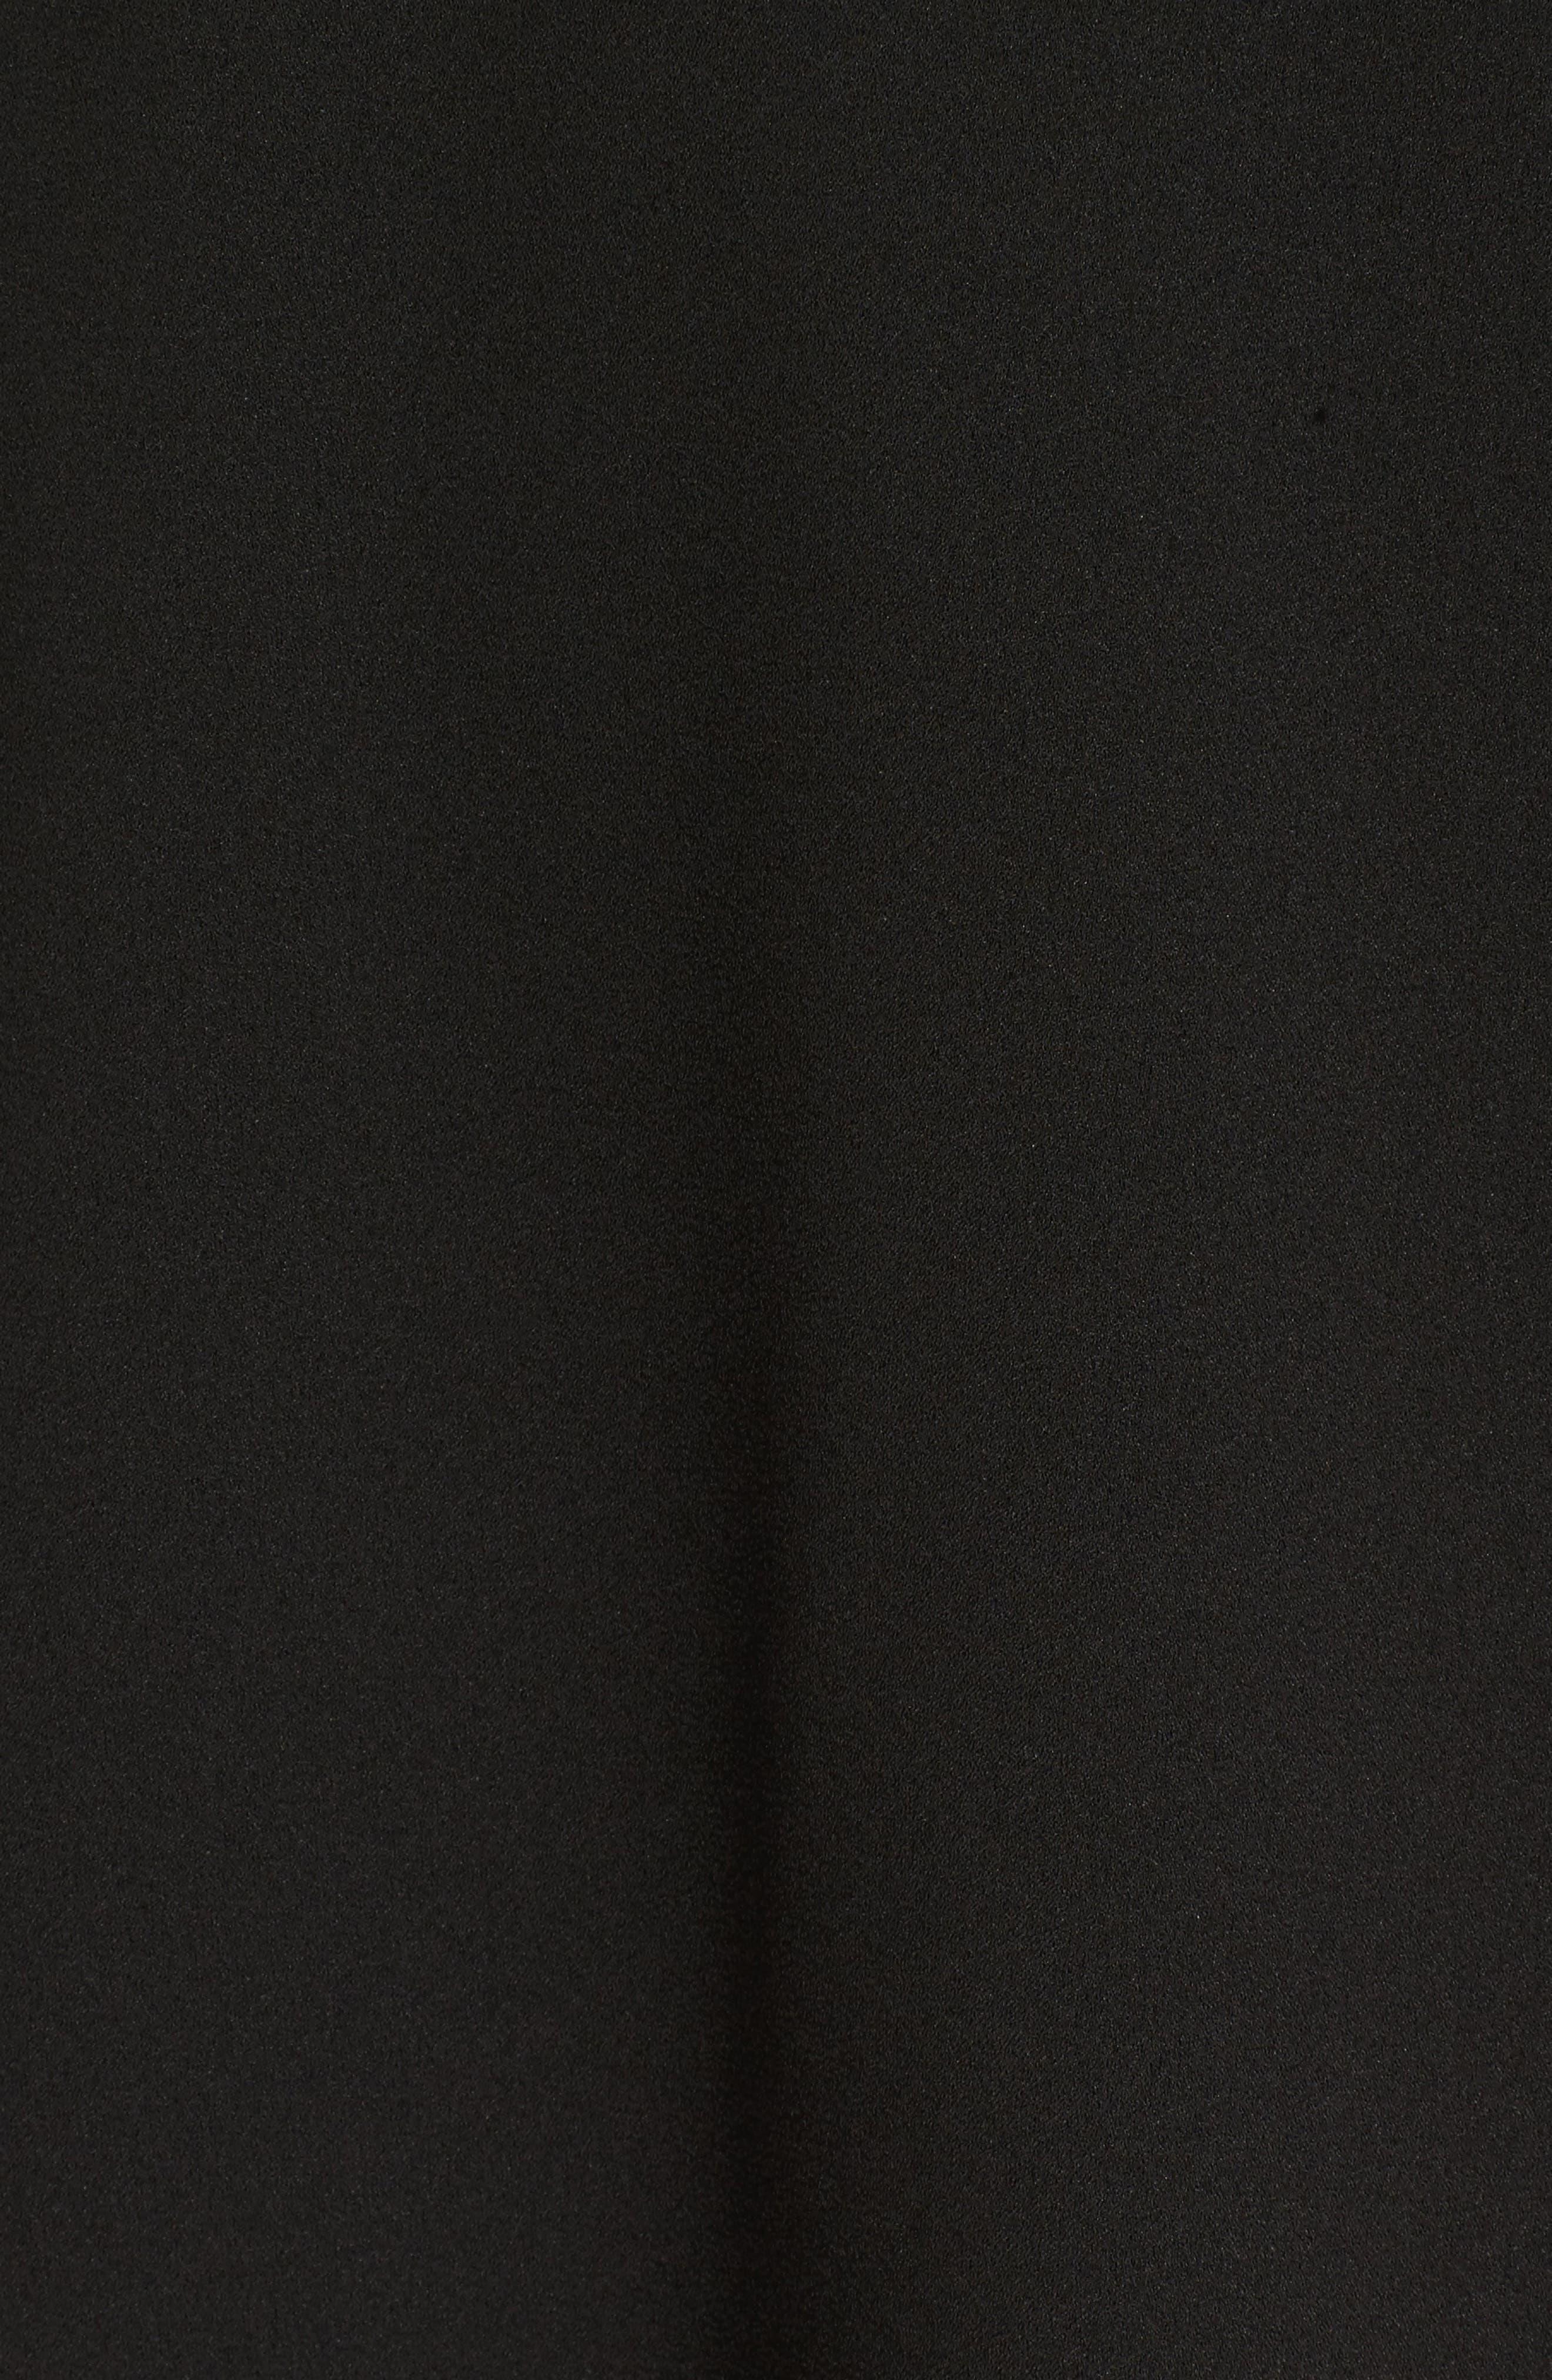 Signe Ruffle A-Line Dress,                             Alternate thumbnail 5, color,                             Black